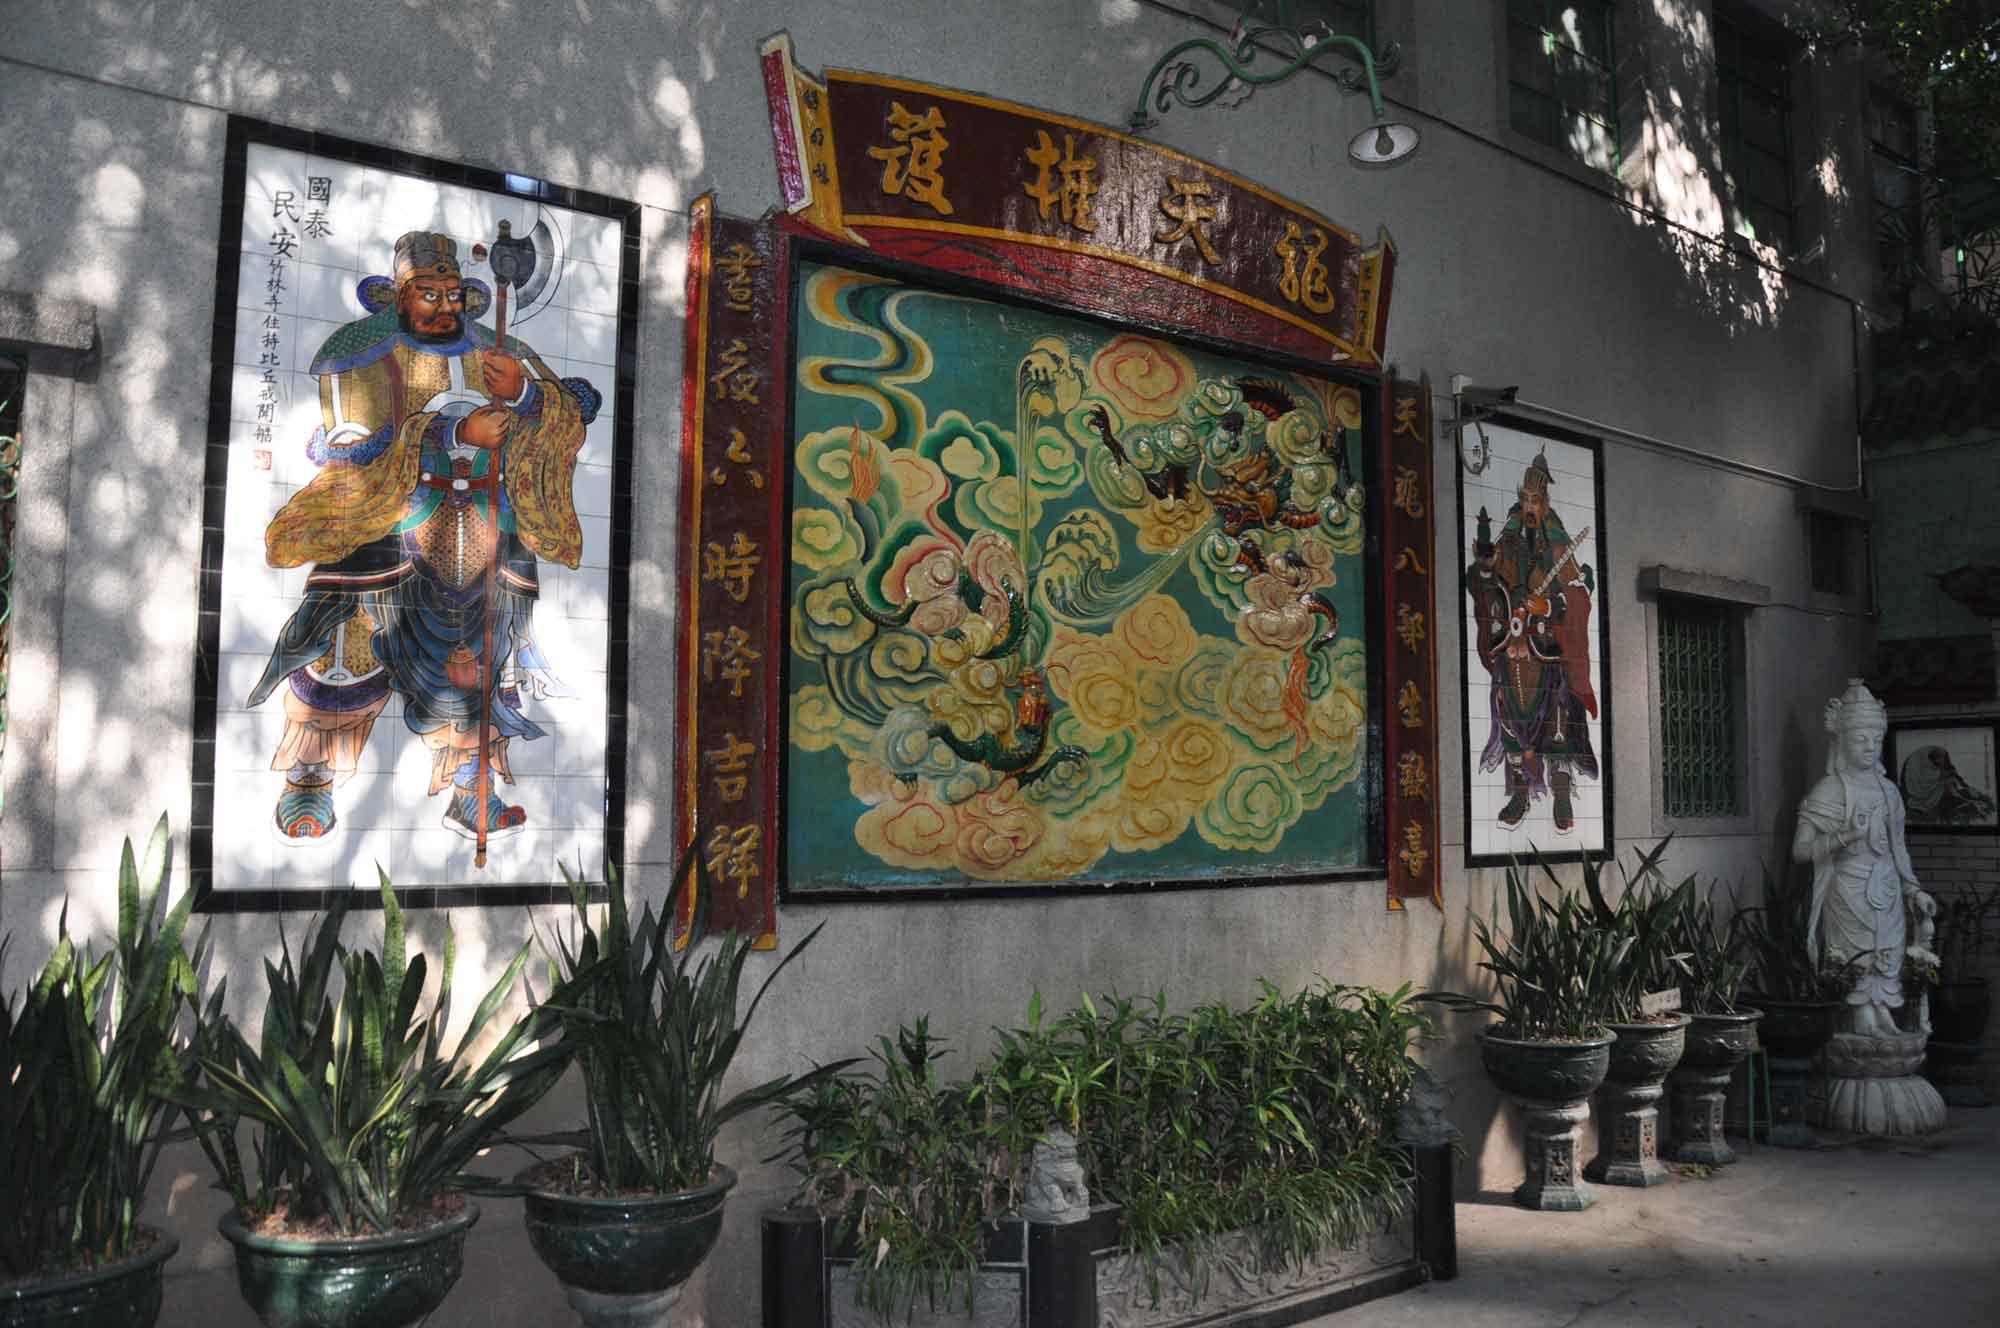 Bamboo Temple entrance art